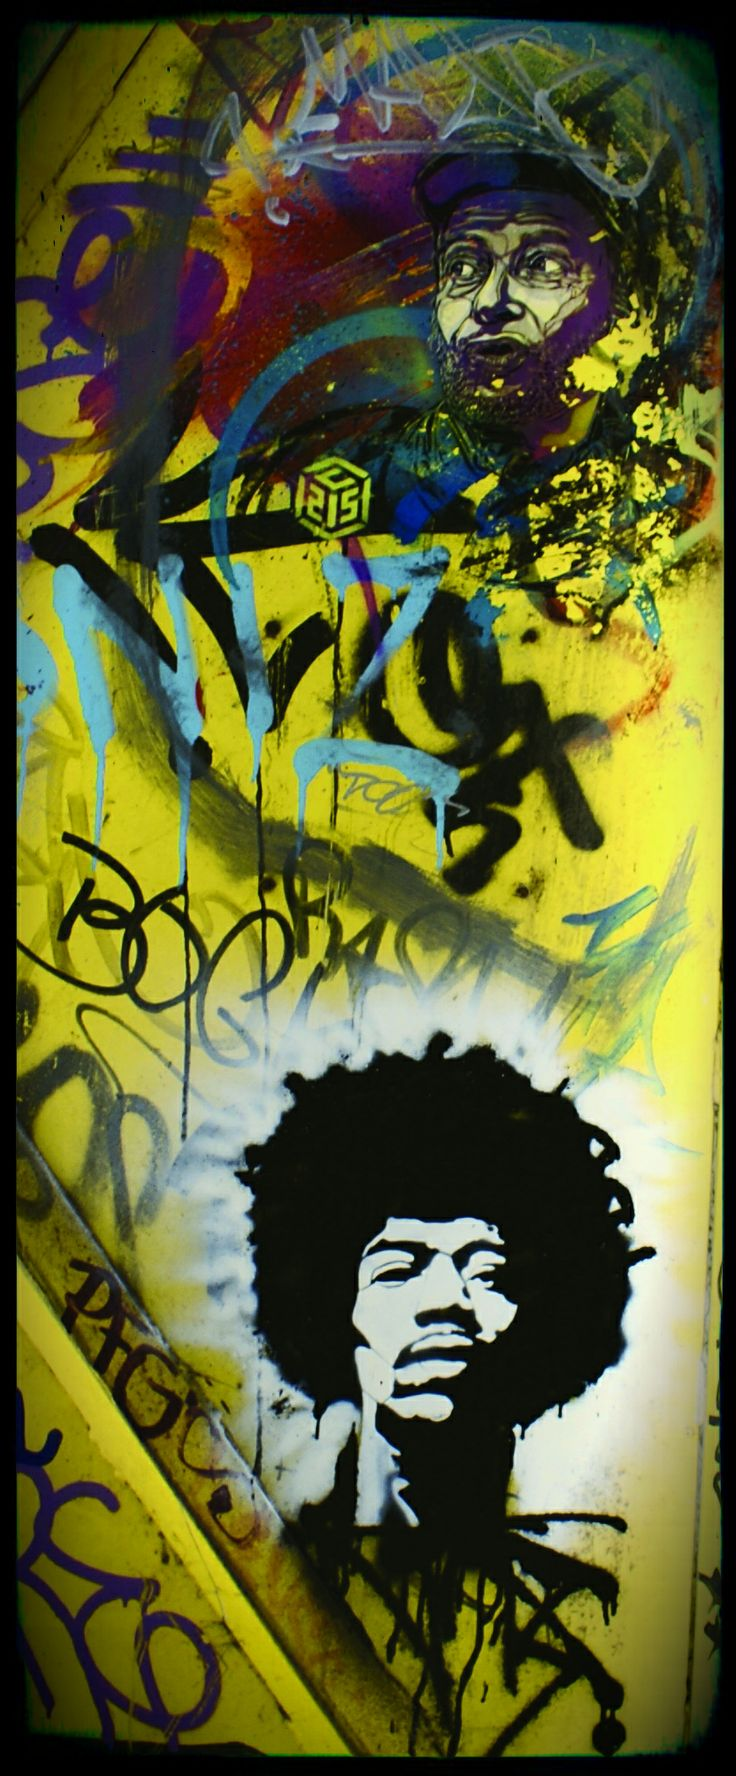 An urban door in NDSM, Amsterdam. ★ Art on top by C215. Below a Jimi Hendrix stencil by @Romeotees ★